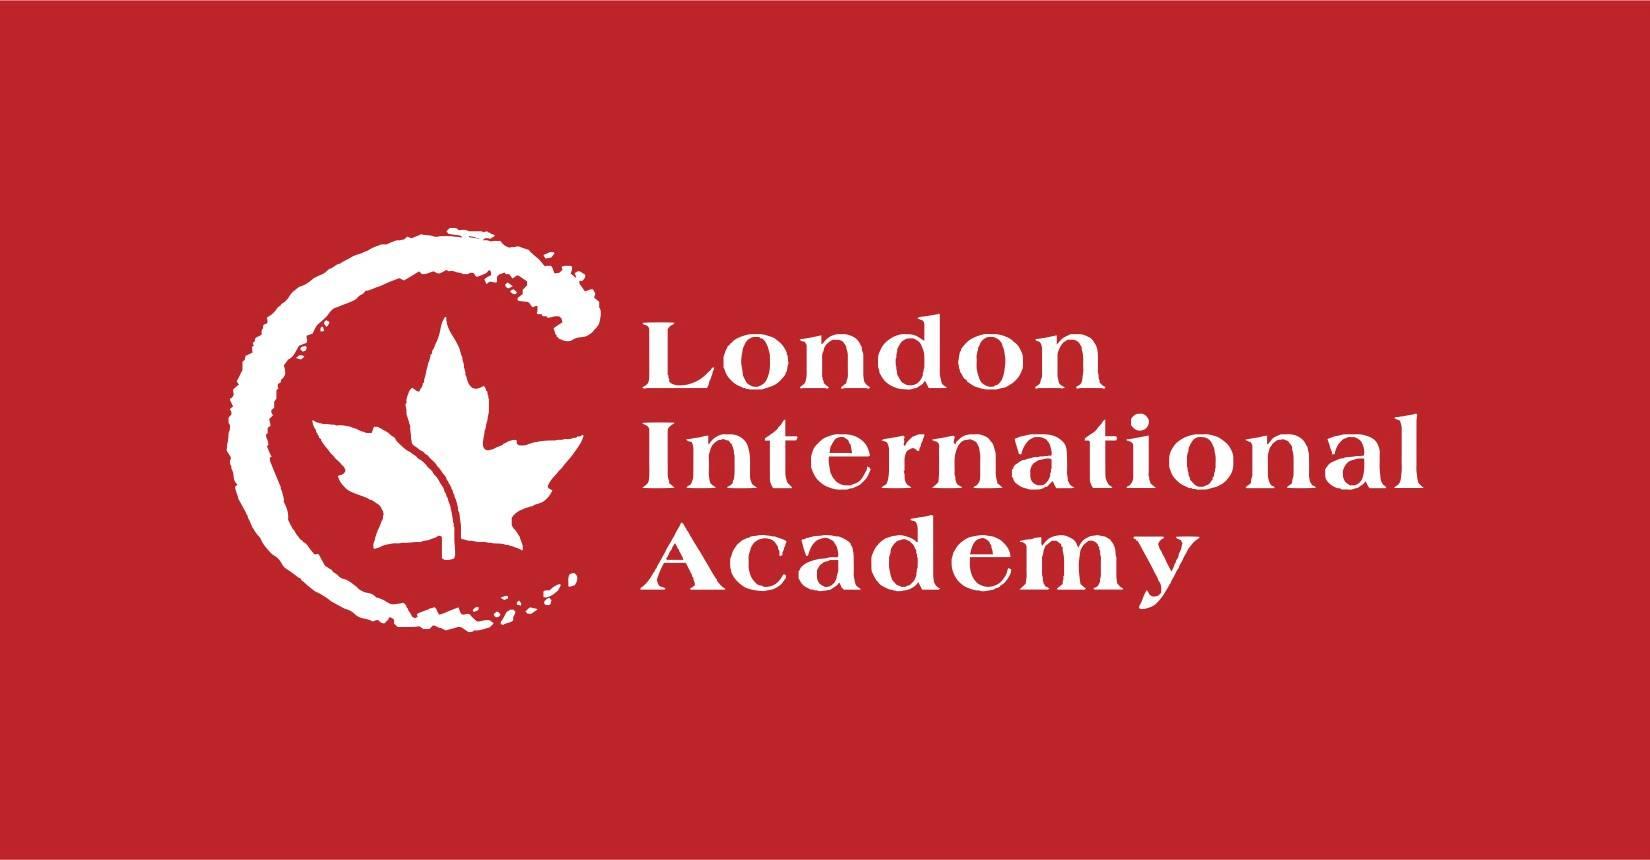 London International Academy